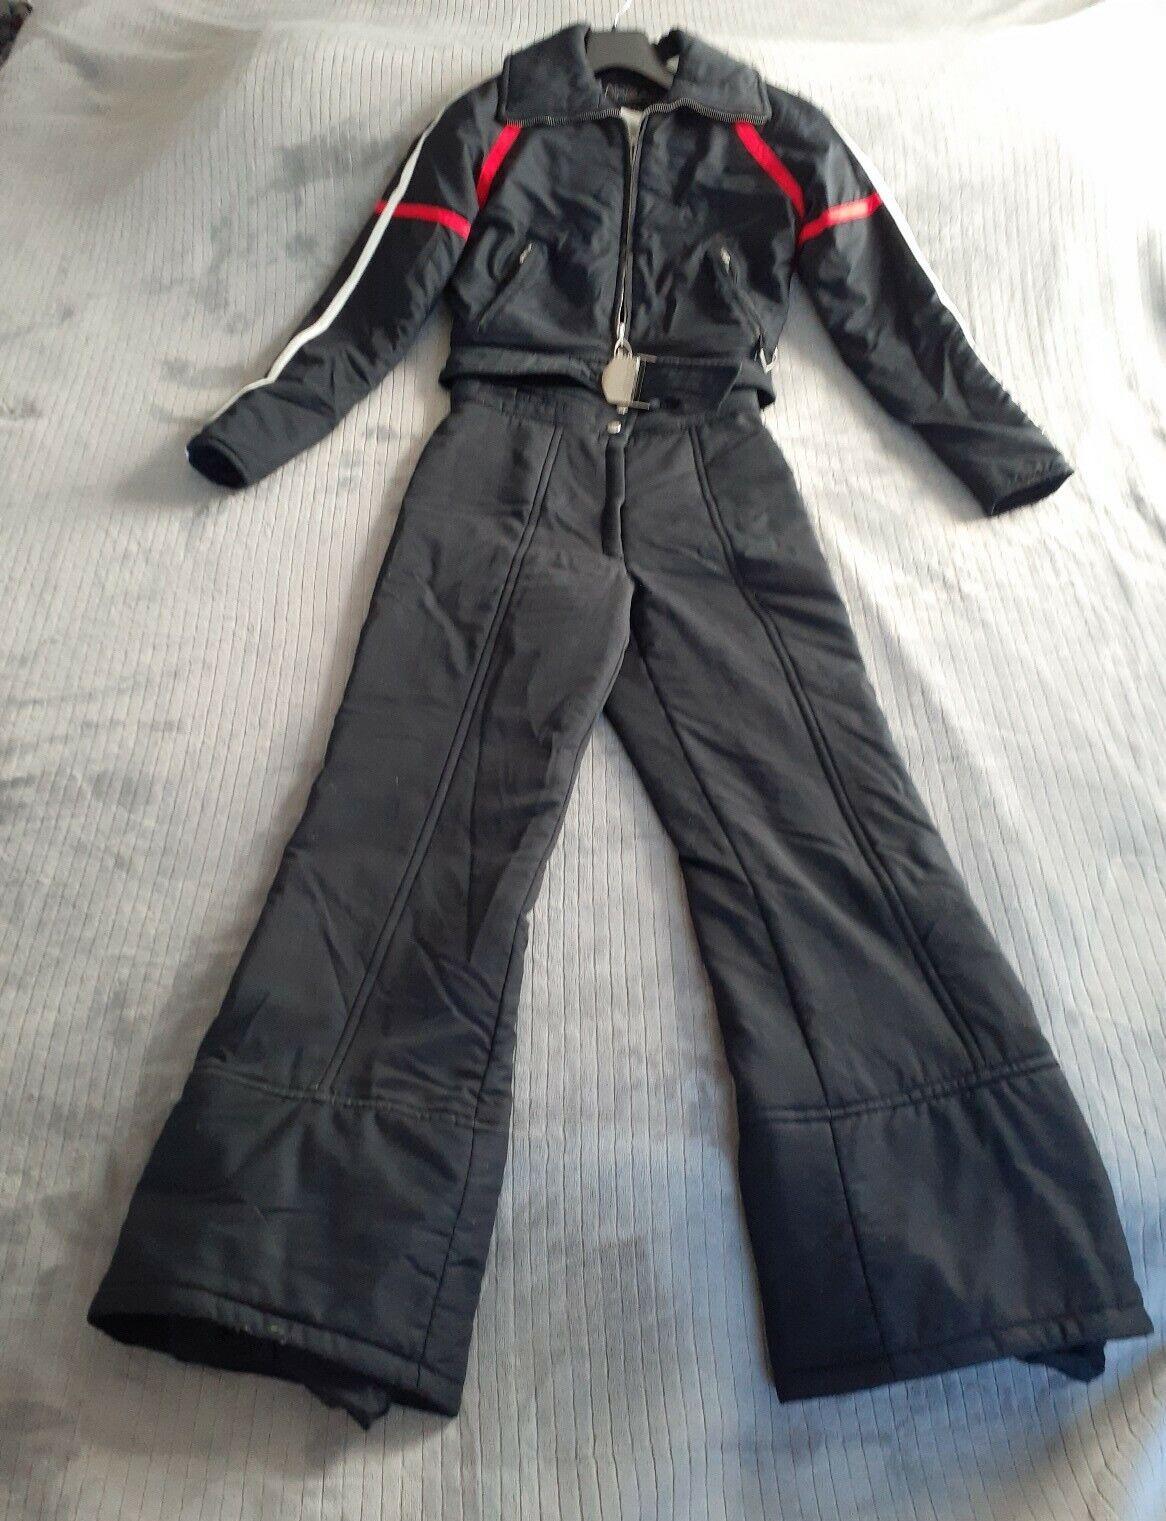 HEAD Sportswear Ski Wear damen Vintage 80's Snow Ski Suit 2 Piece BIB Größe 8